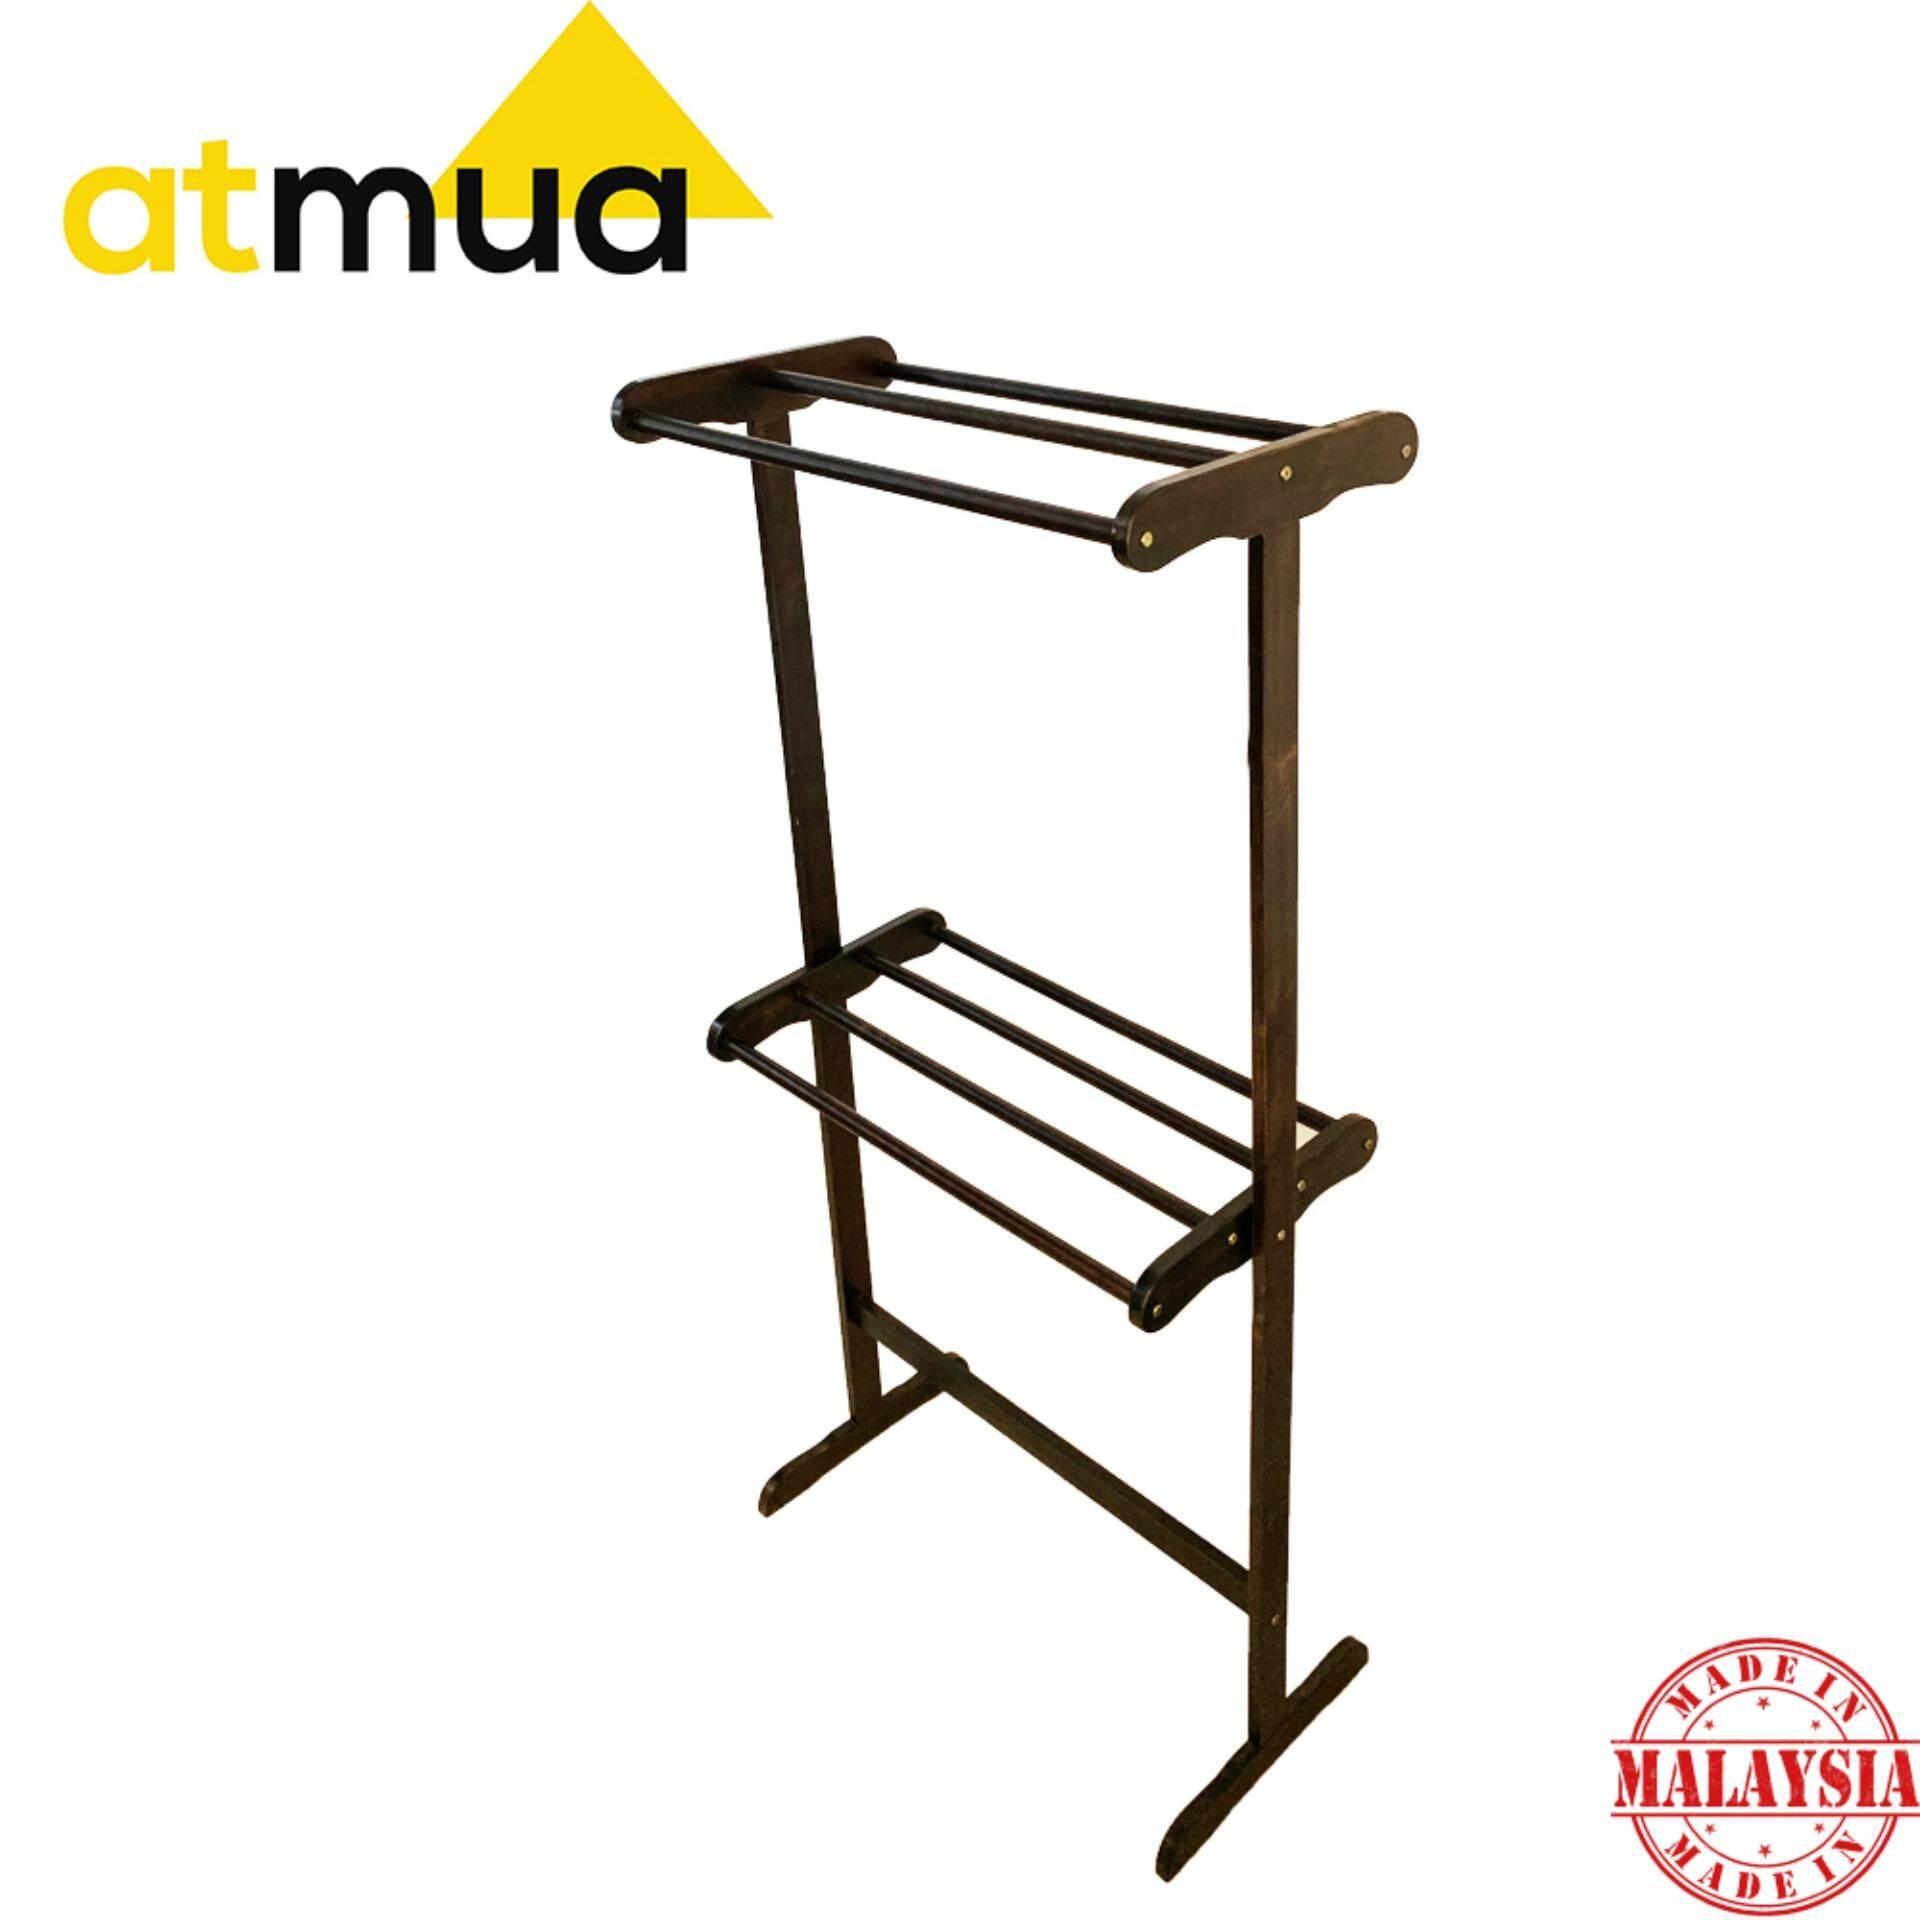 Atmua Habi Big Towel Rack - [Full Solid Wood]